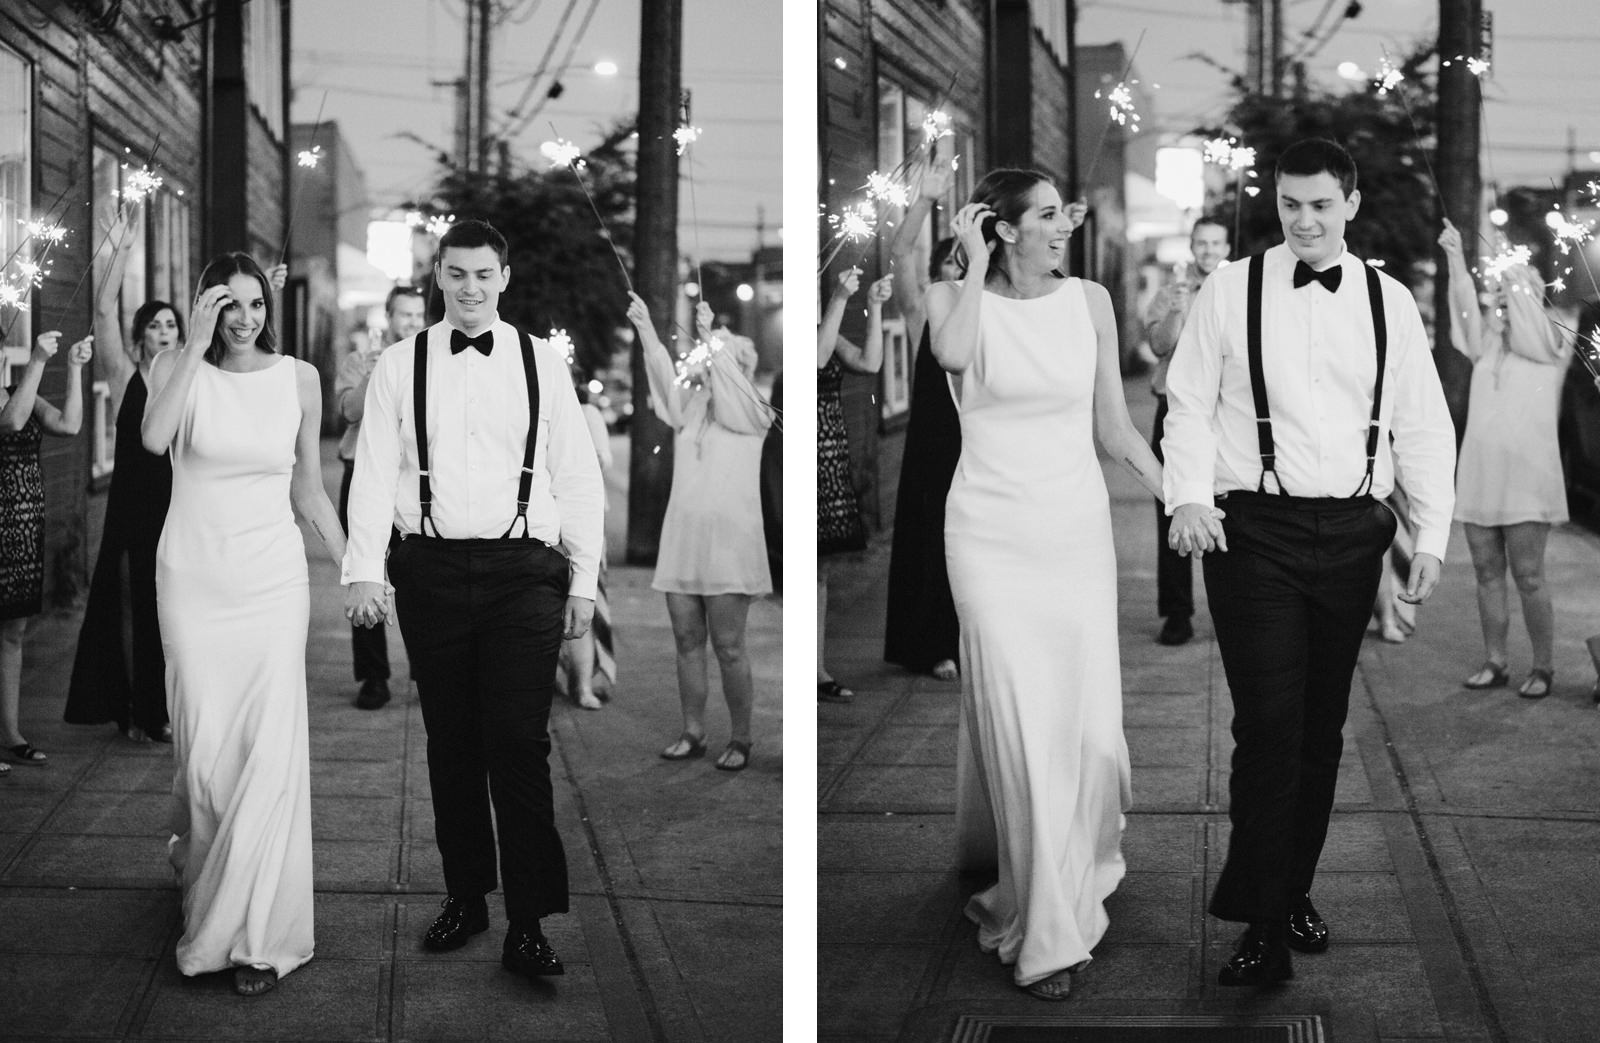 sodo-park-wedding-096 SODO PARK WEDDING